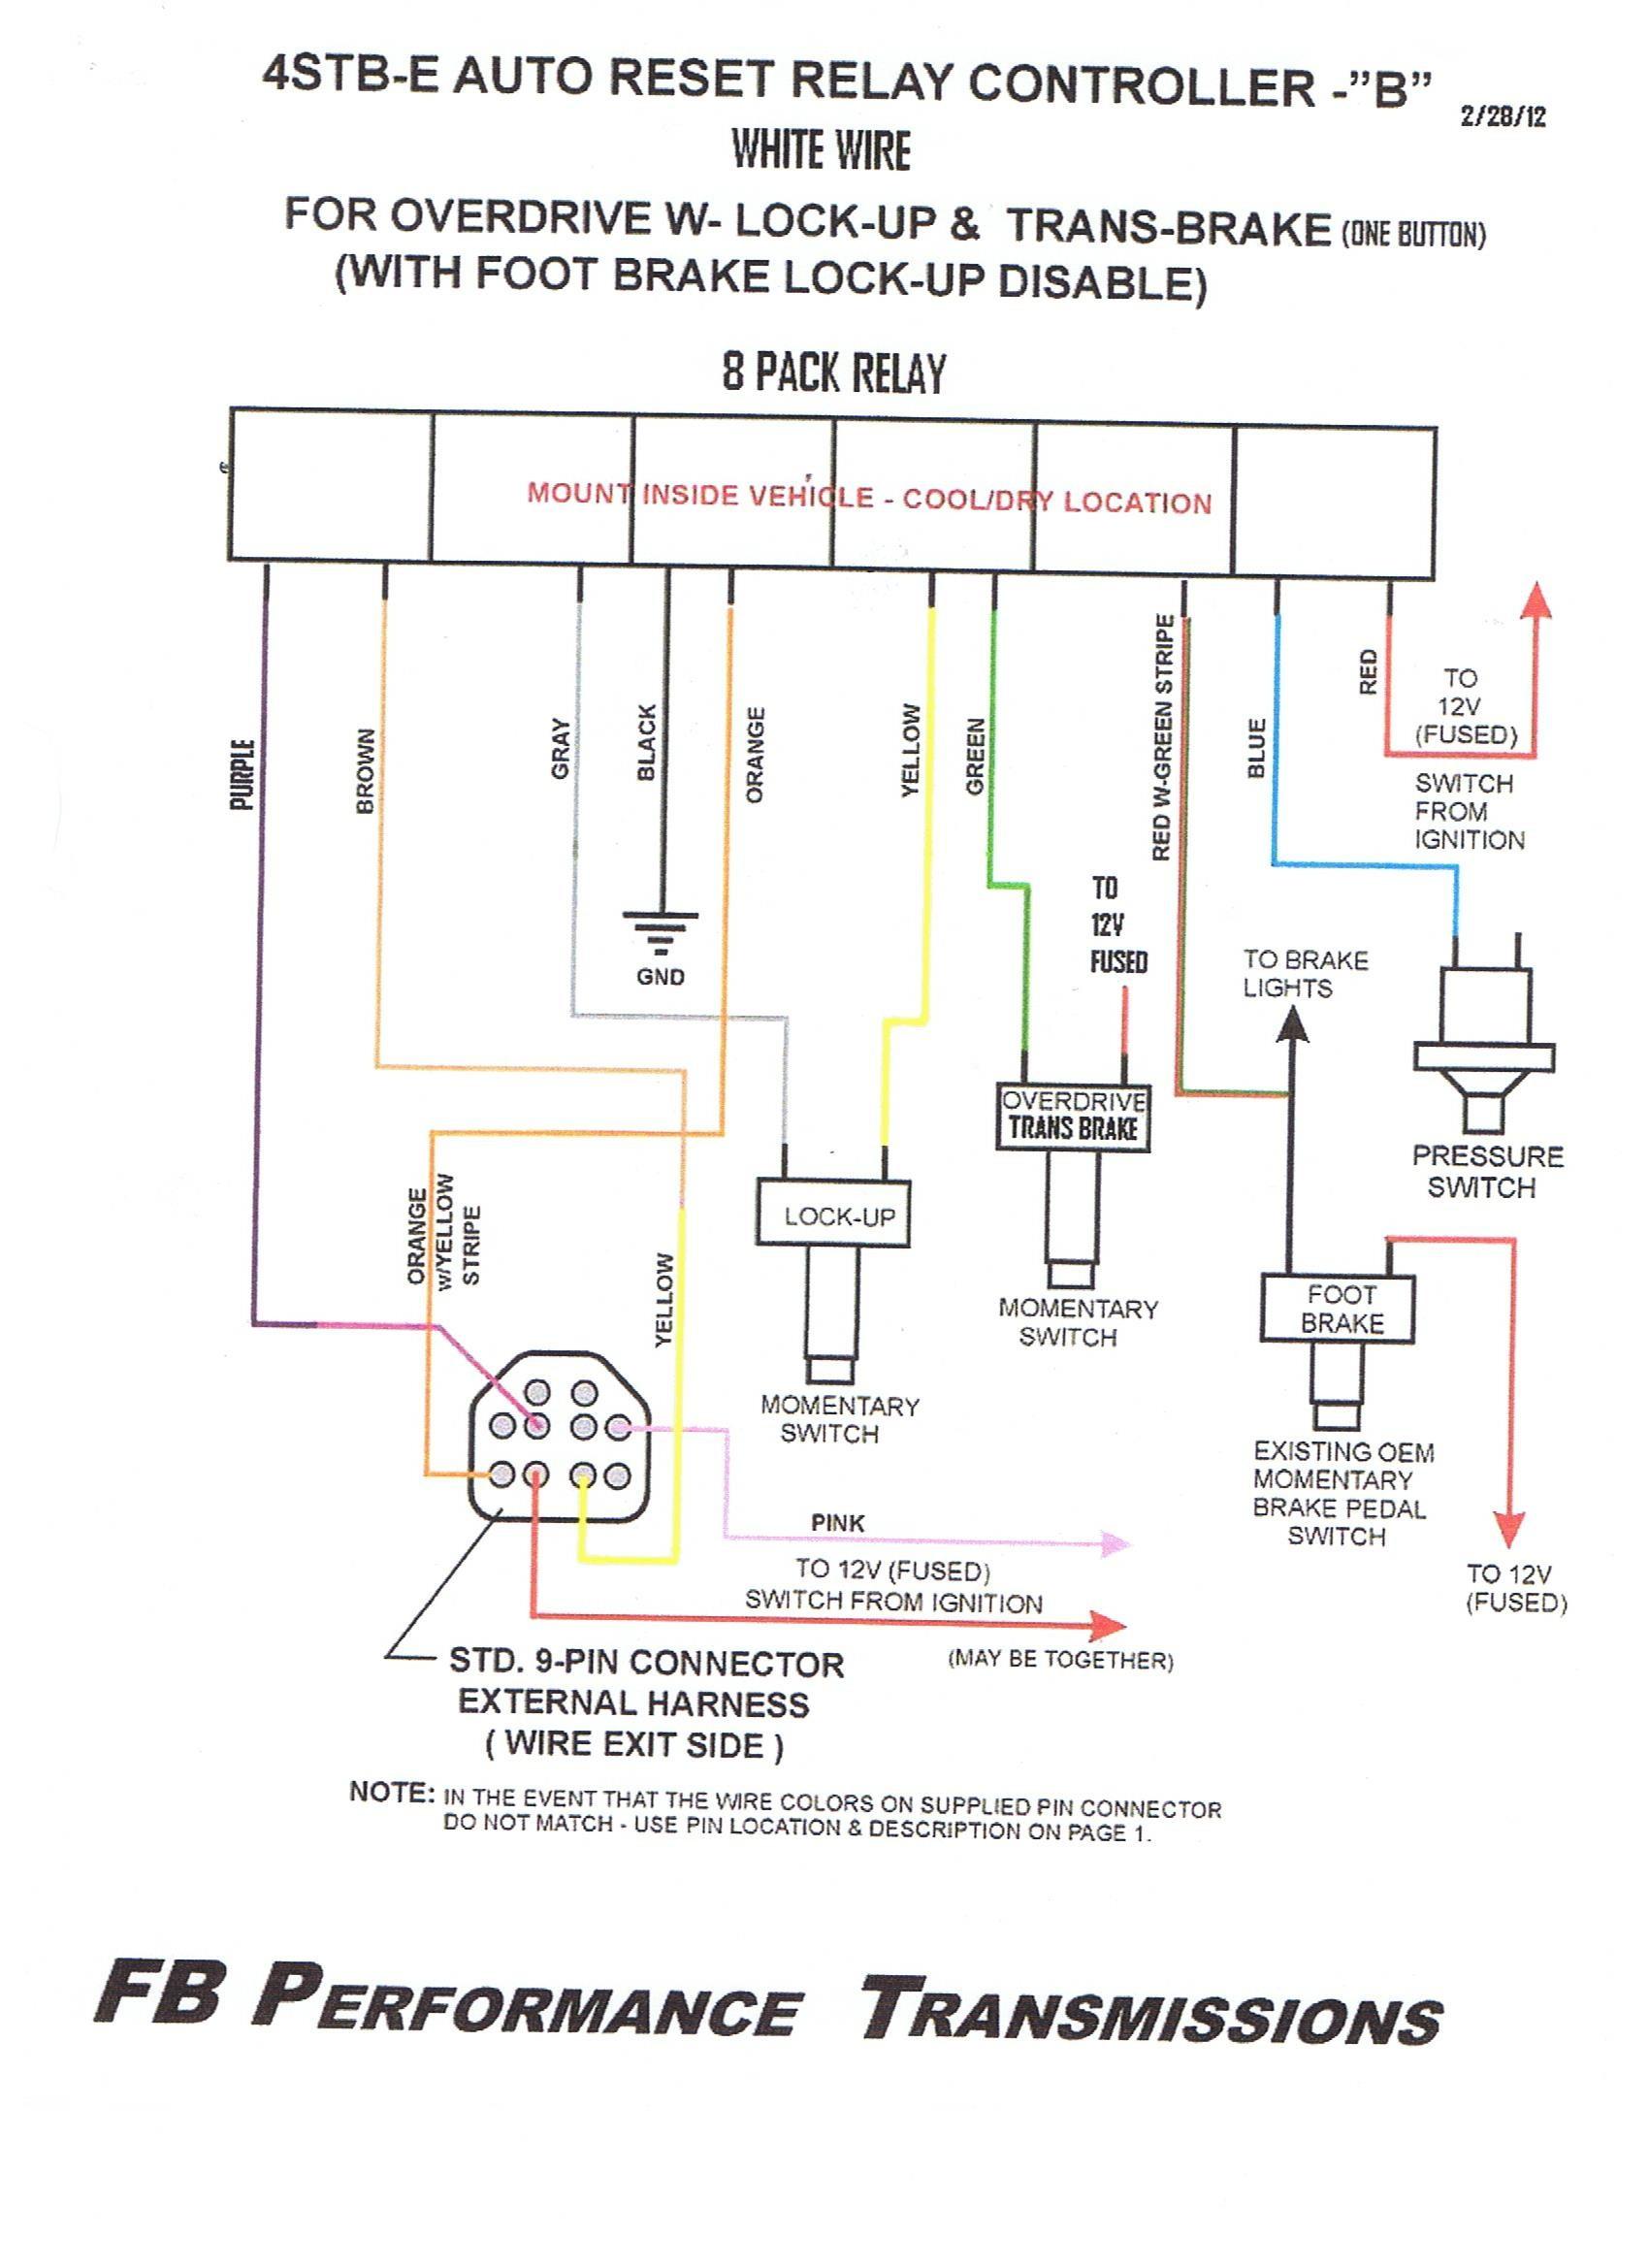 Third Brake Light Wiring Diagram Wiring Diagram for Bulkhead Lights 2017 4r70w Wiring Od button Wire Of Third Brake Light Wiring Diagram